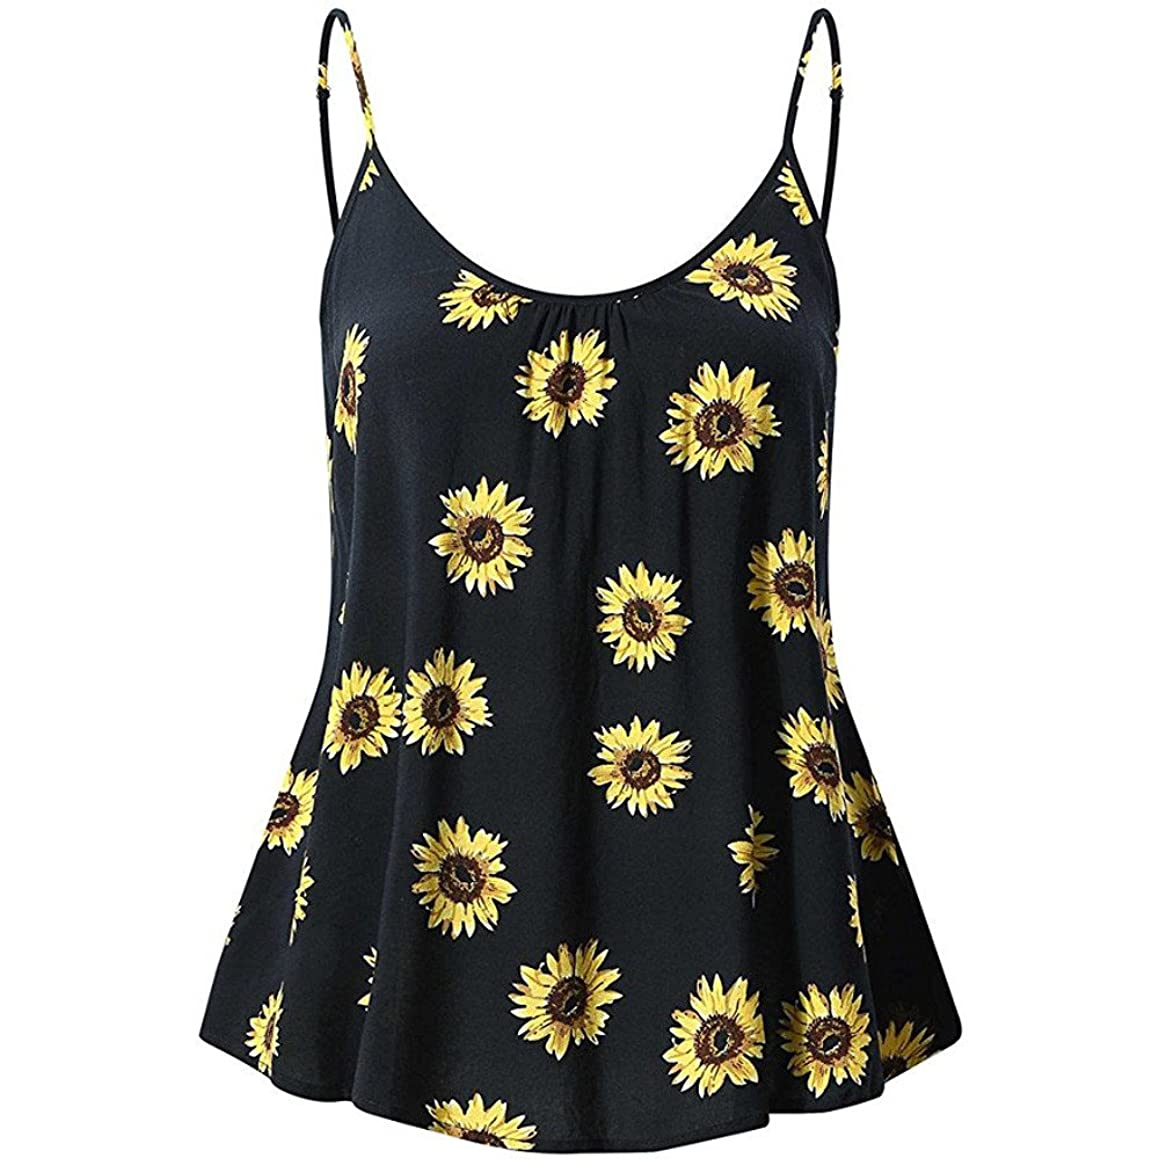 Aniywn Women Sunflower Print Sleeveless Vest Shirt Ladies Hem Flare Spaghetti Strappy Tank Tops